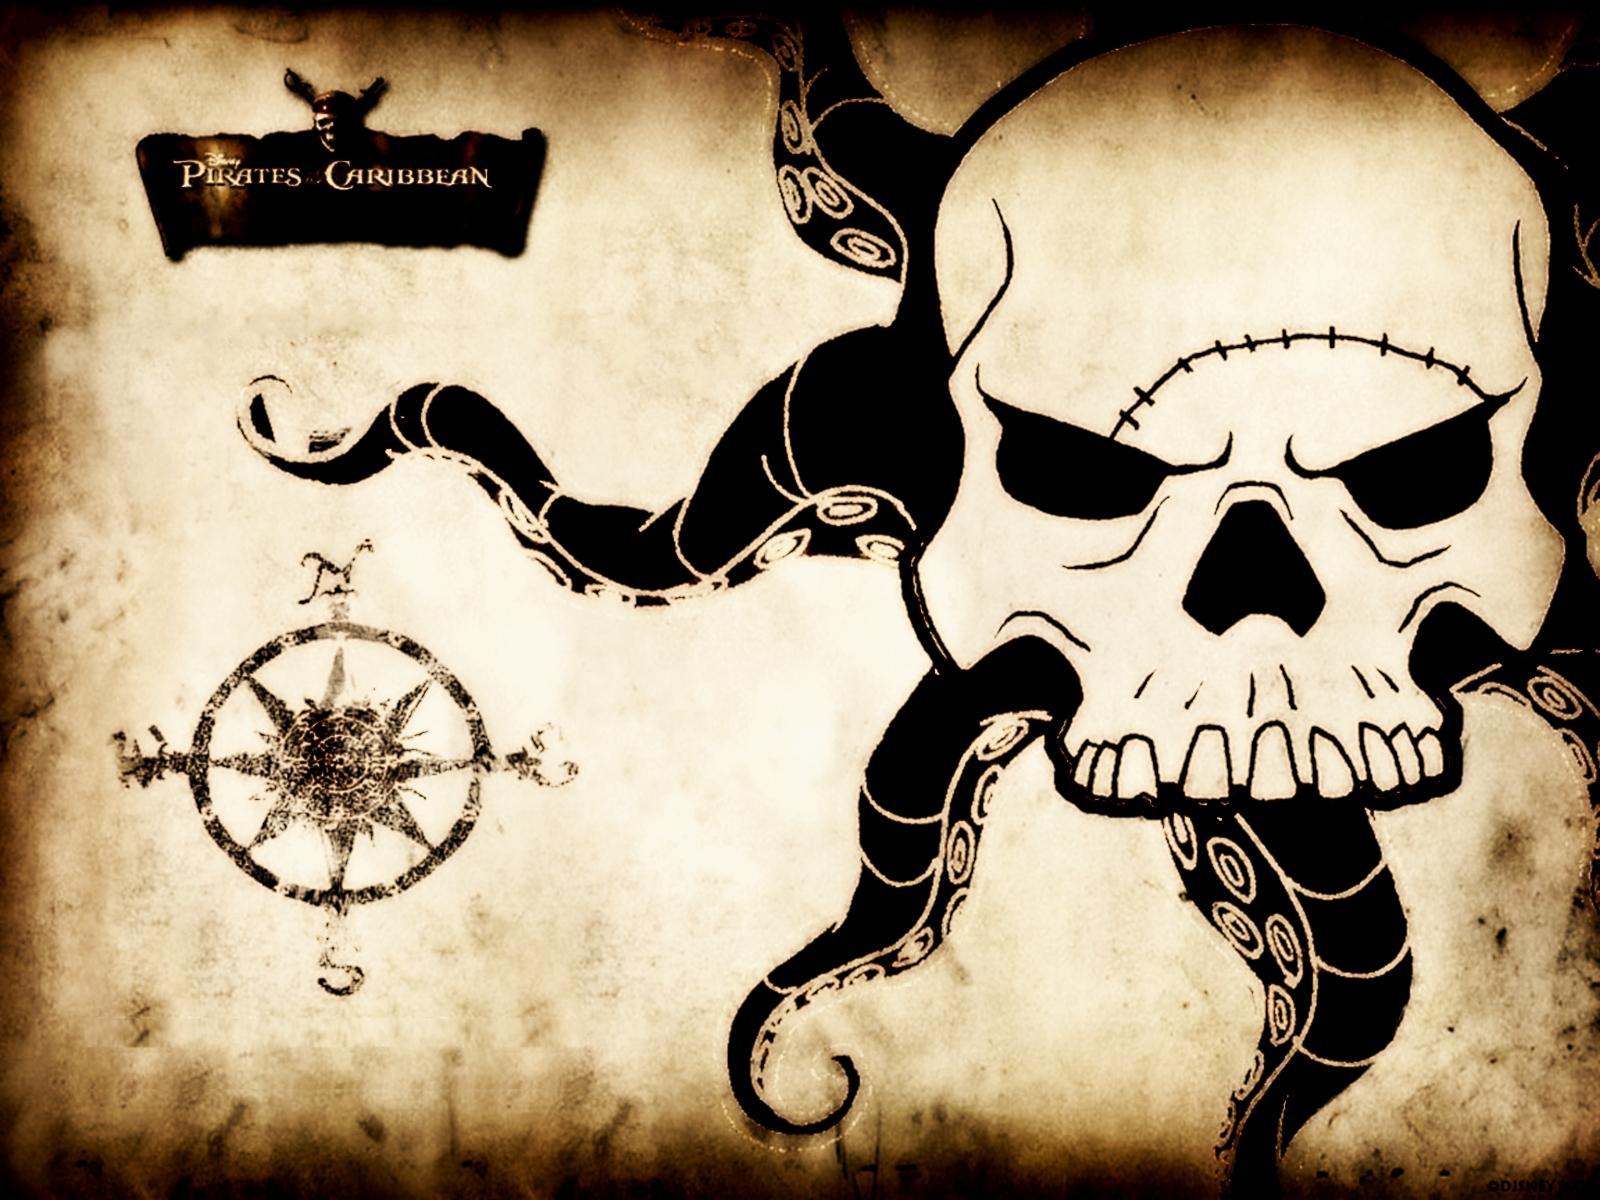 Wallpaper Hd Pirates Of The Caribbean Pirates Of The Caribbean Wallpaper And Background Image